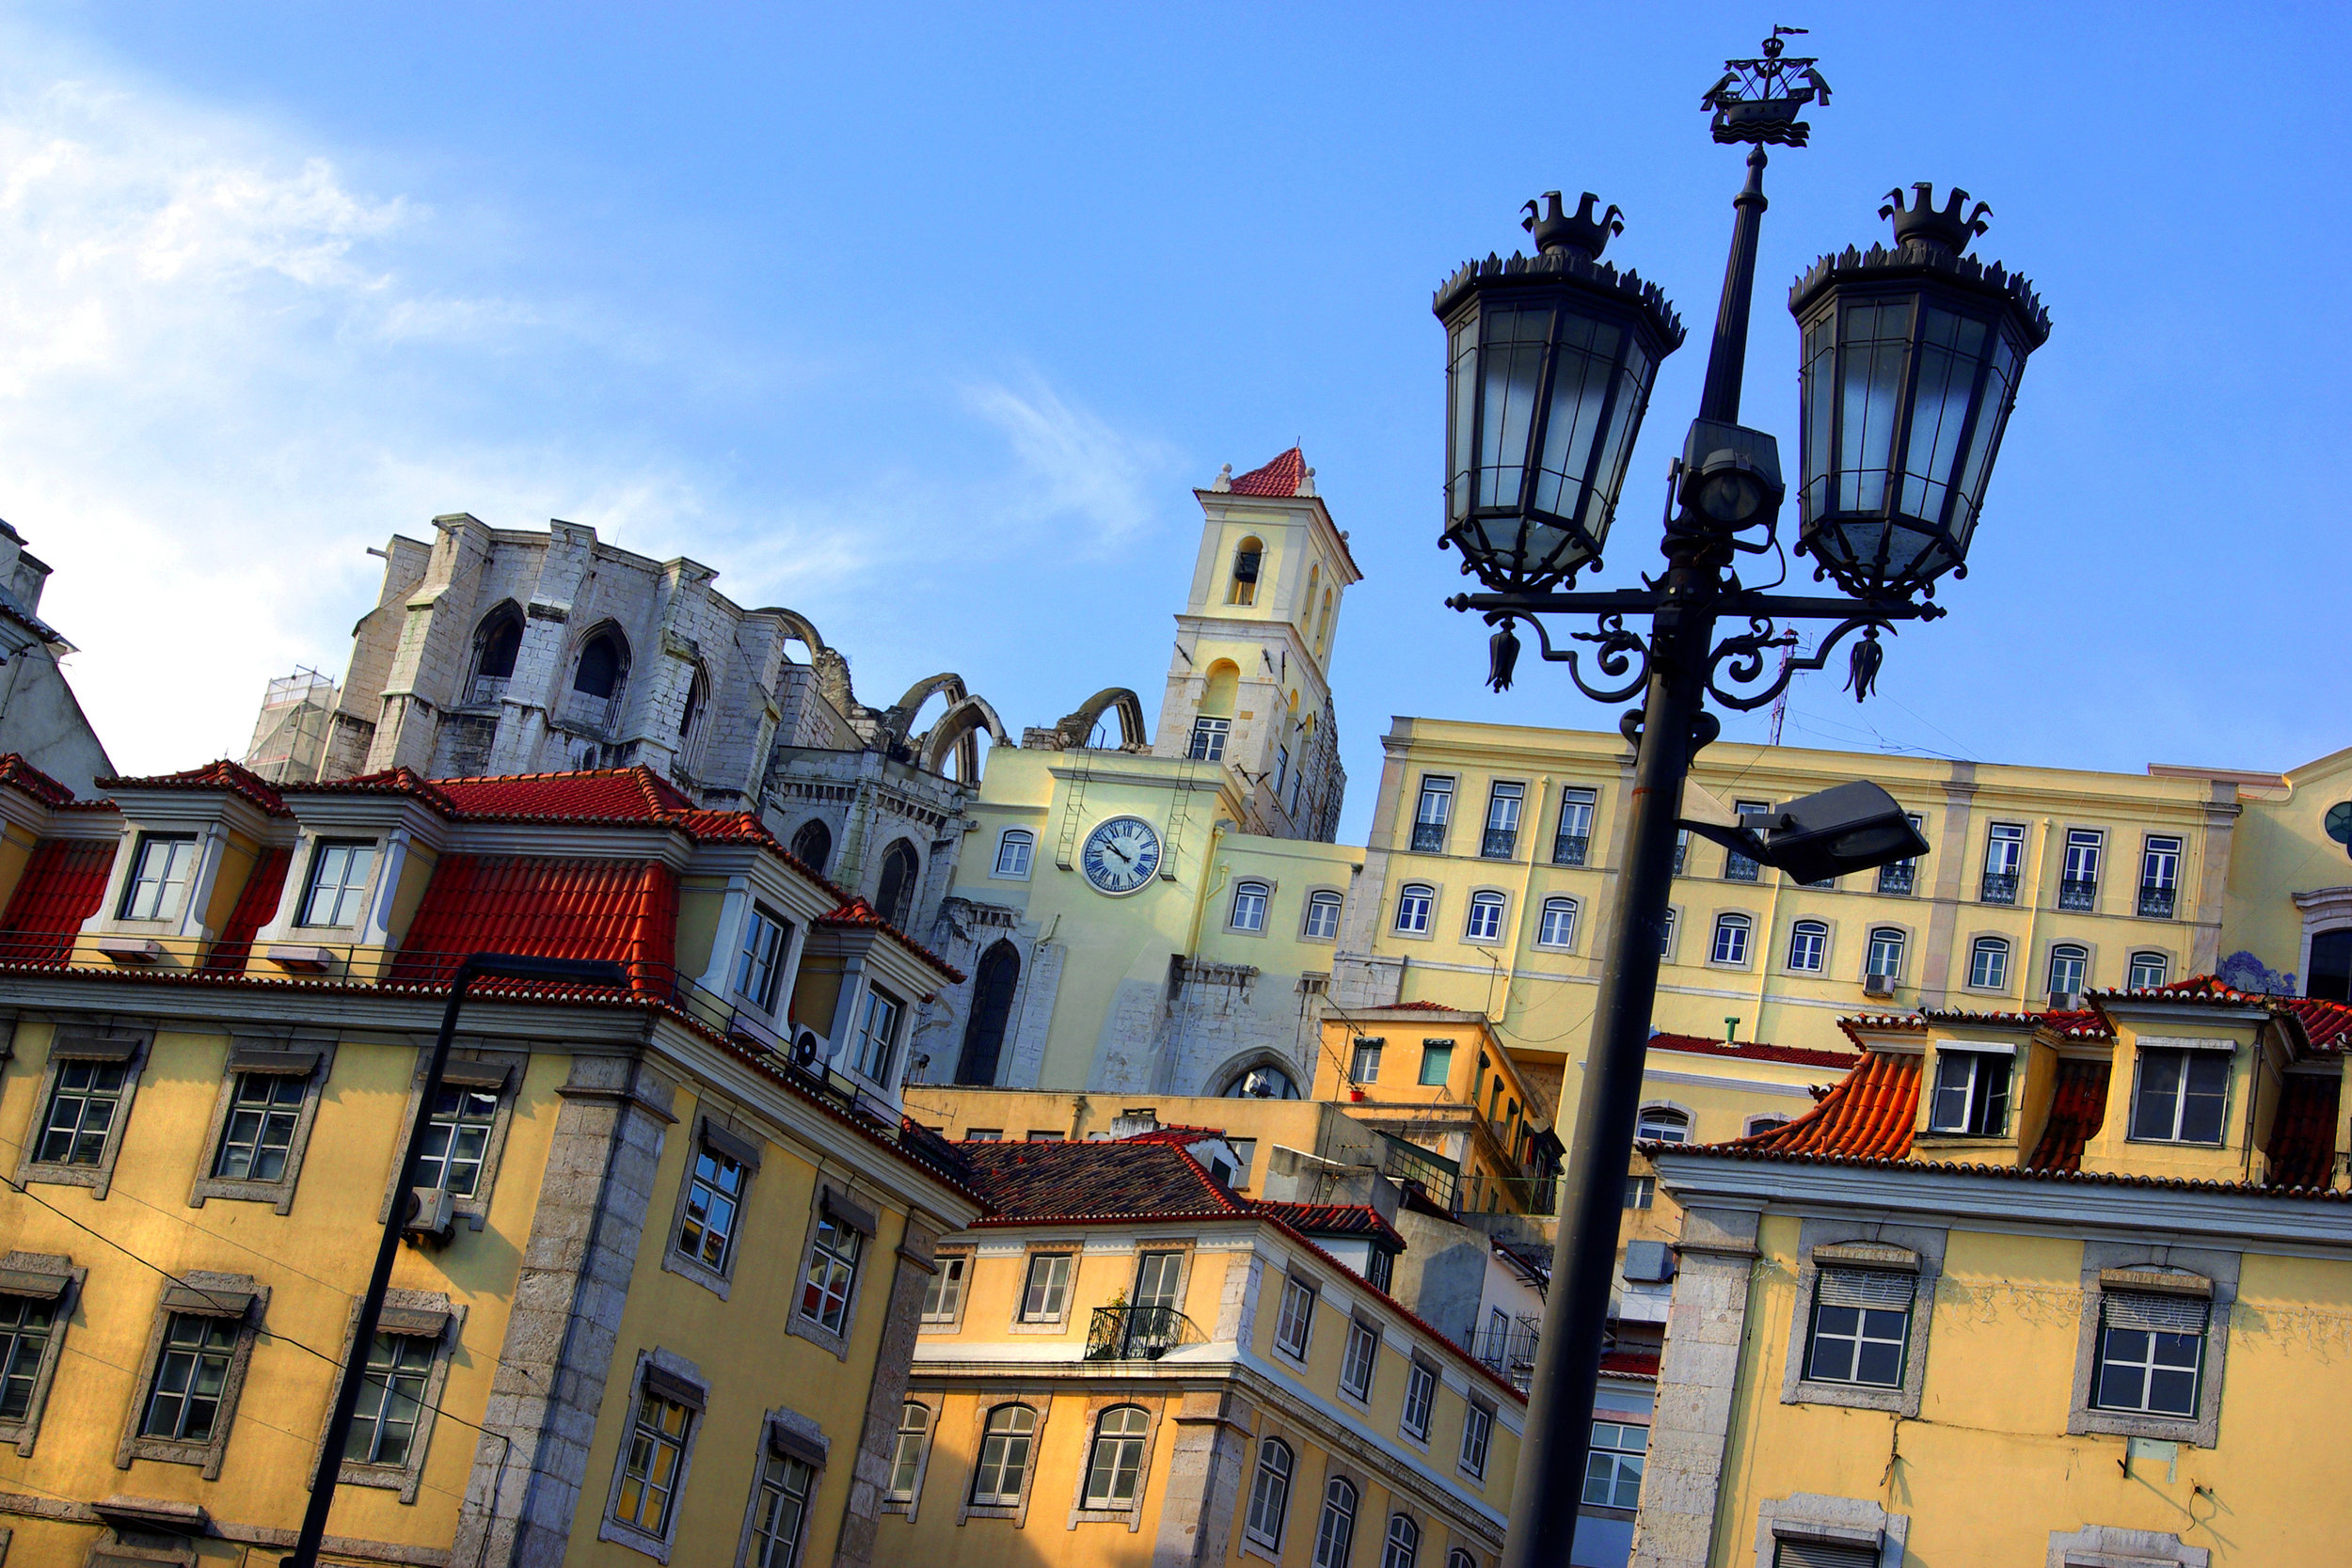 bigstock-Panorama-of-the-old-Lisbon-wit-16537547.jpg